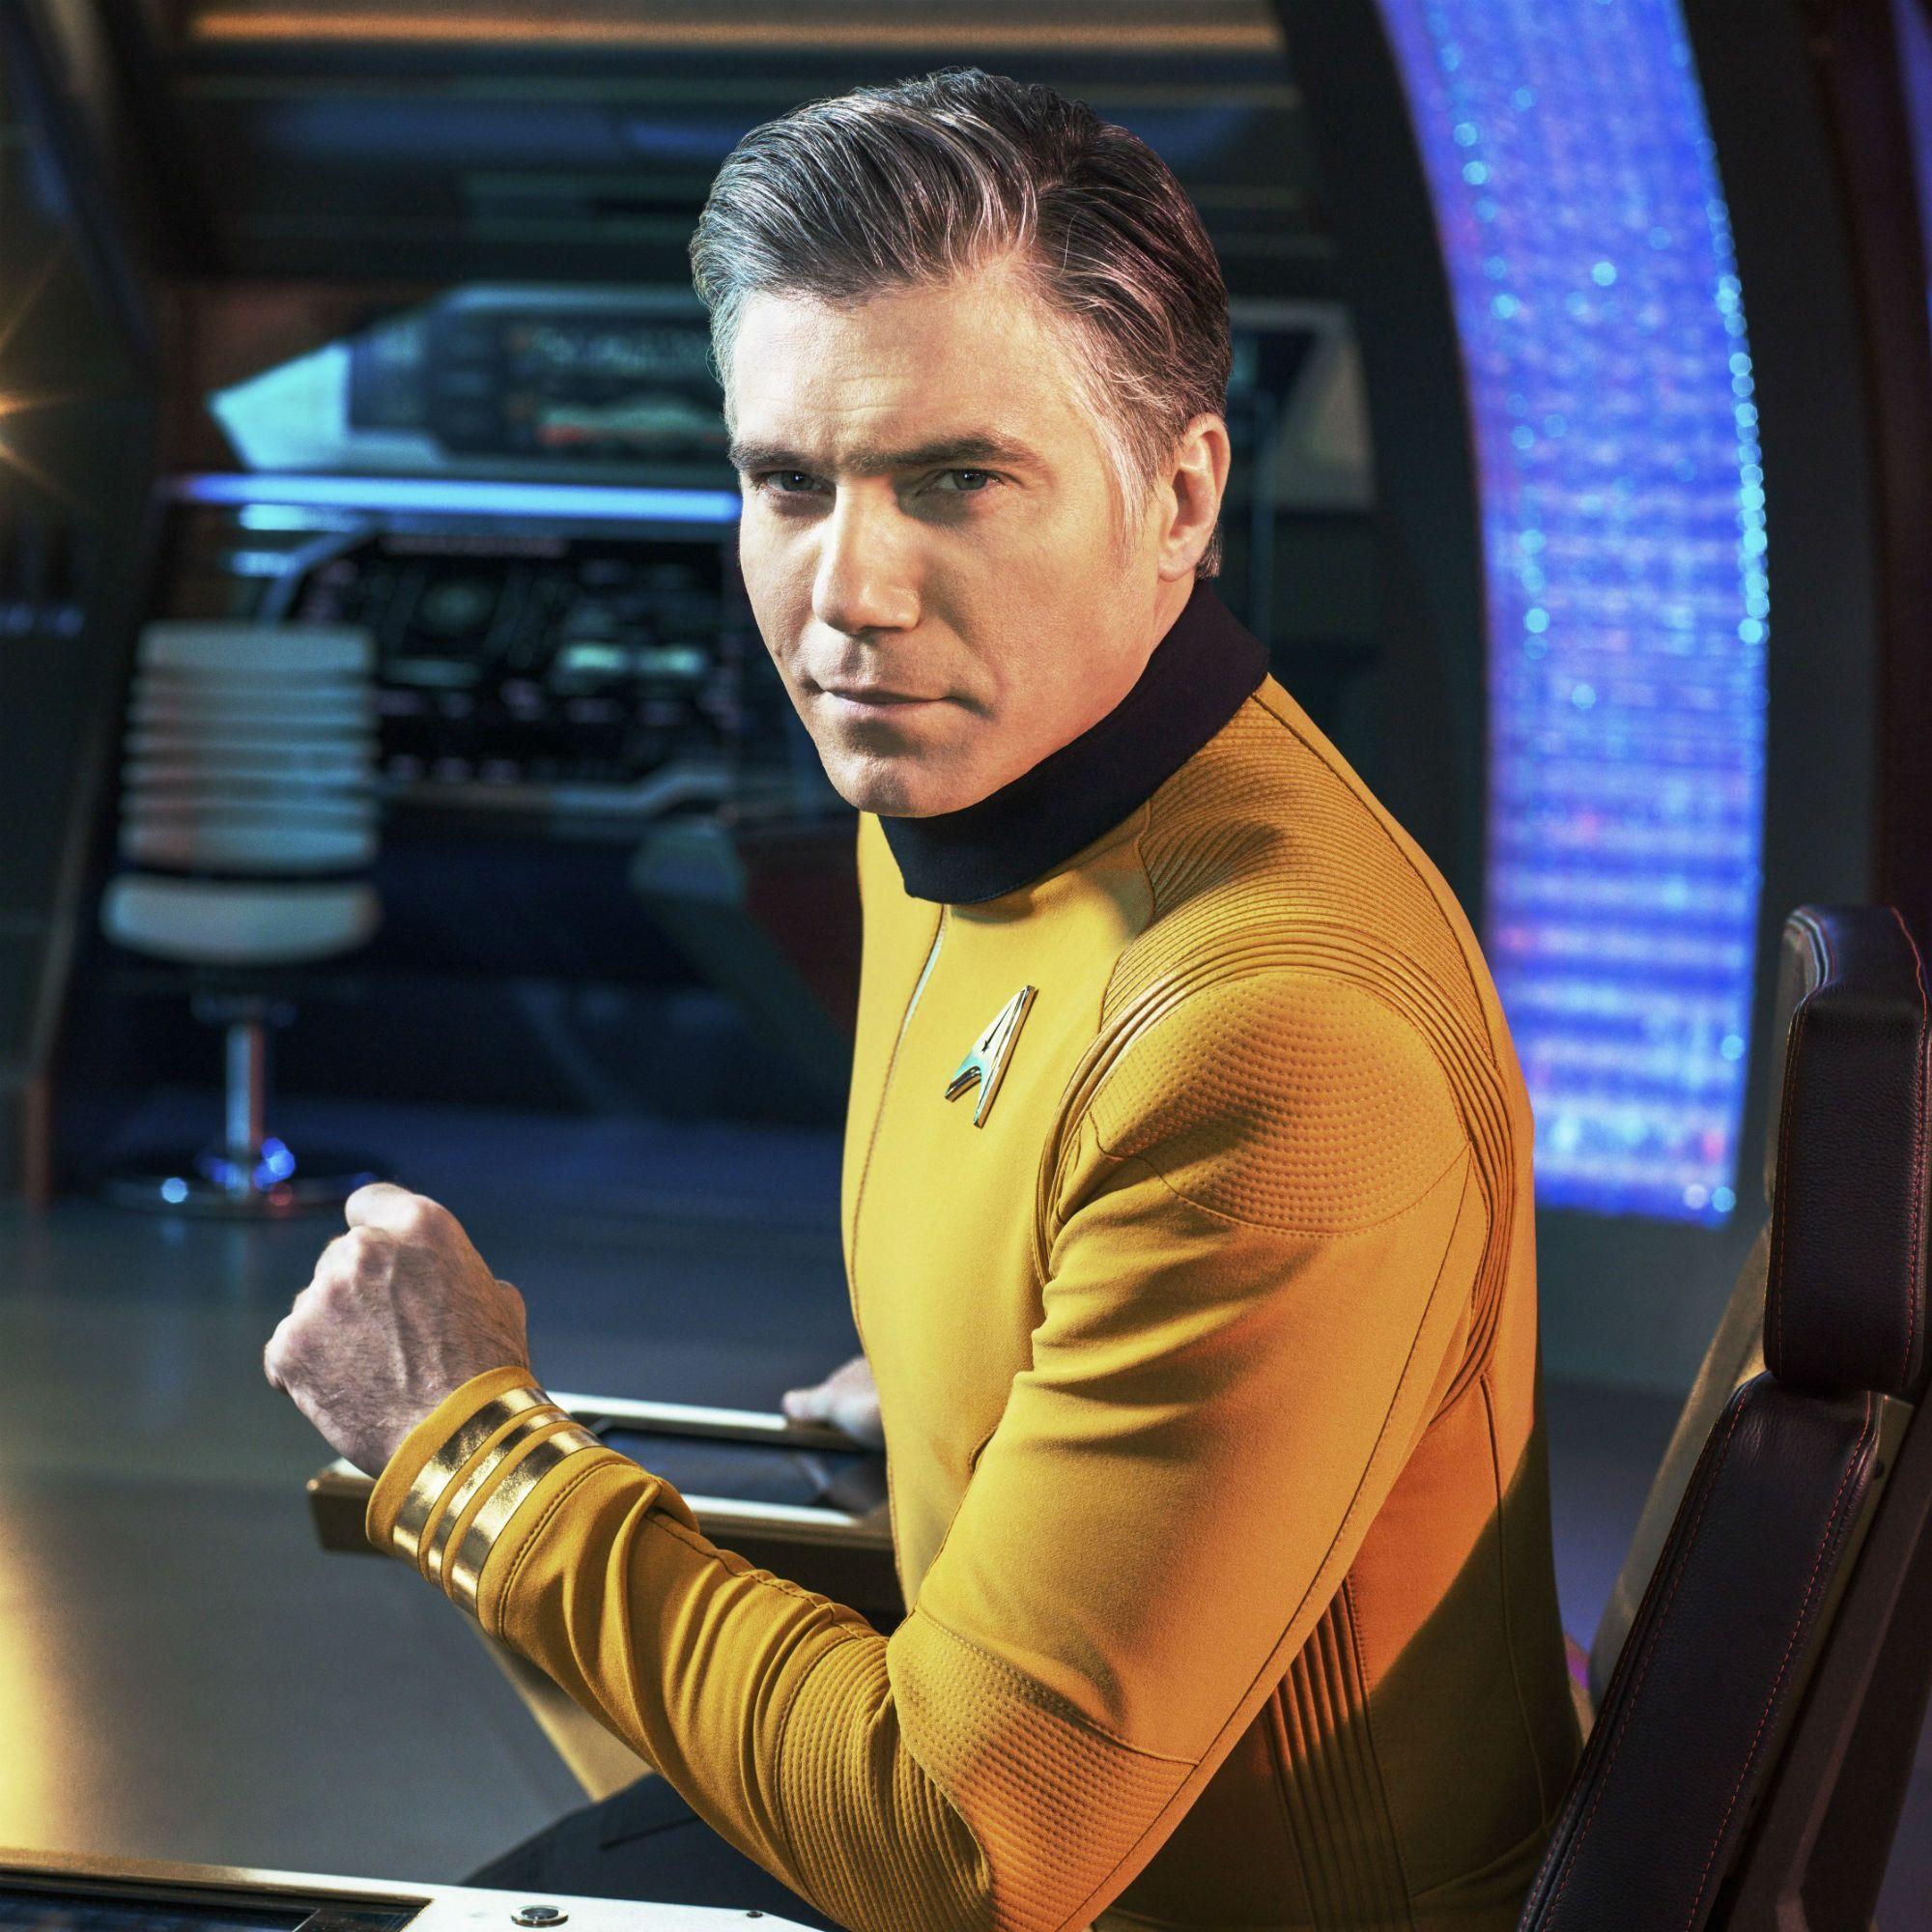 Watch Star Trek: Discovery's Captain Pike return in new Short Treks trailer